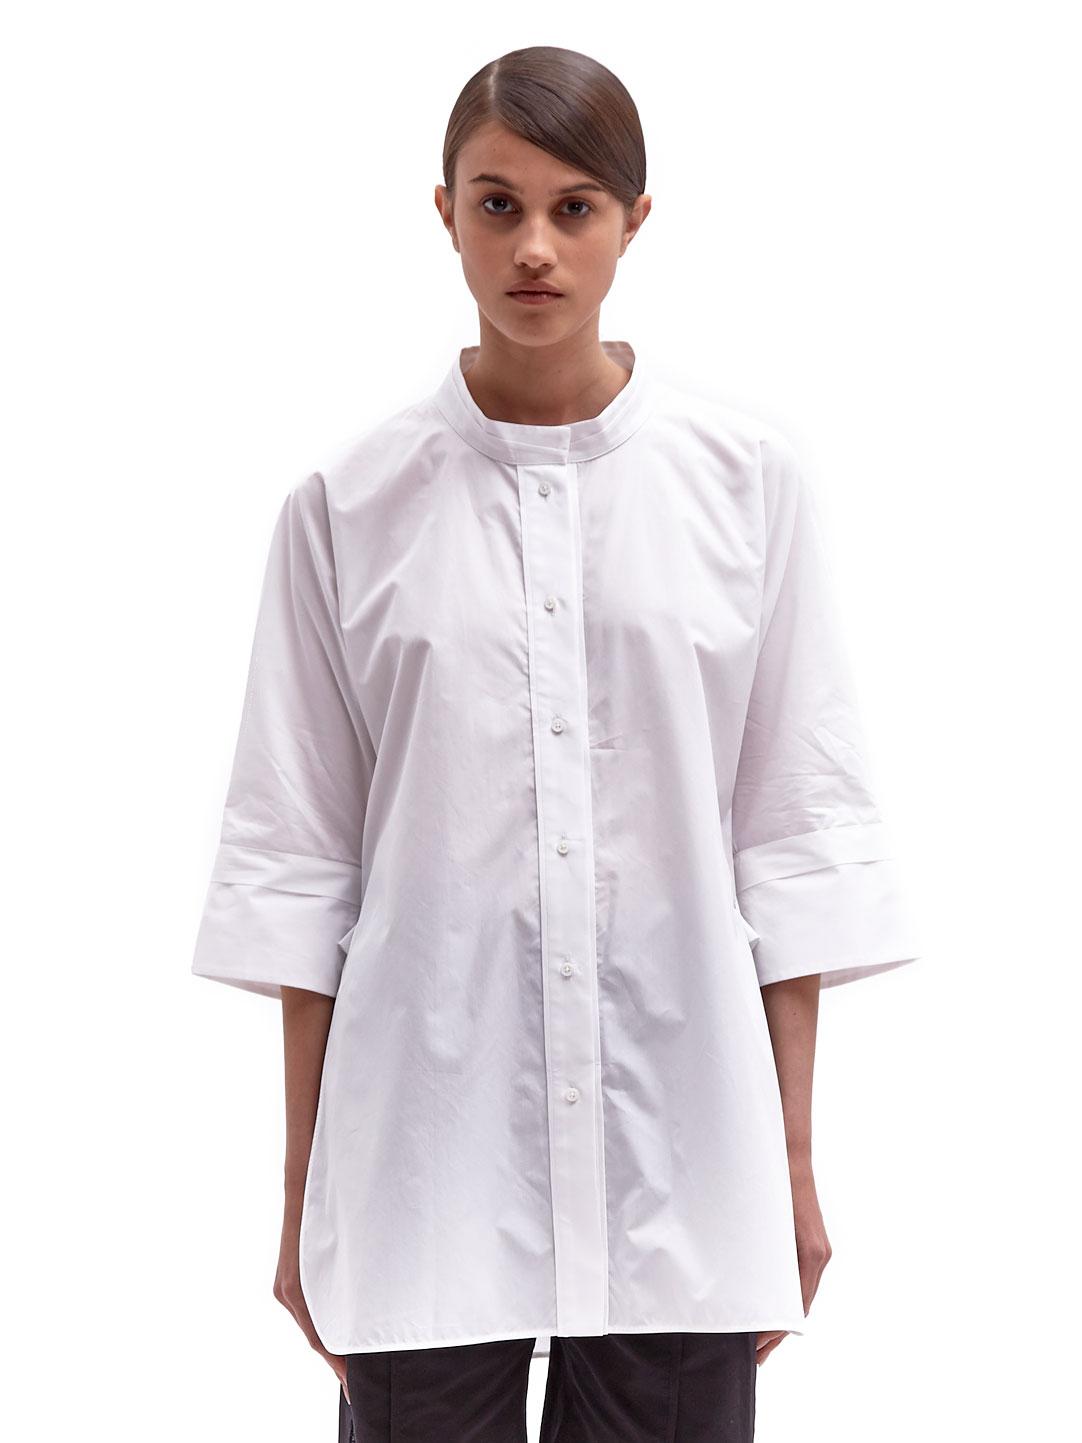 Fine clothing for women